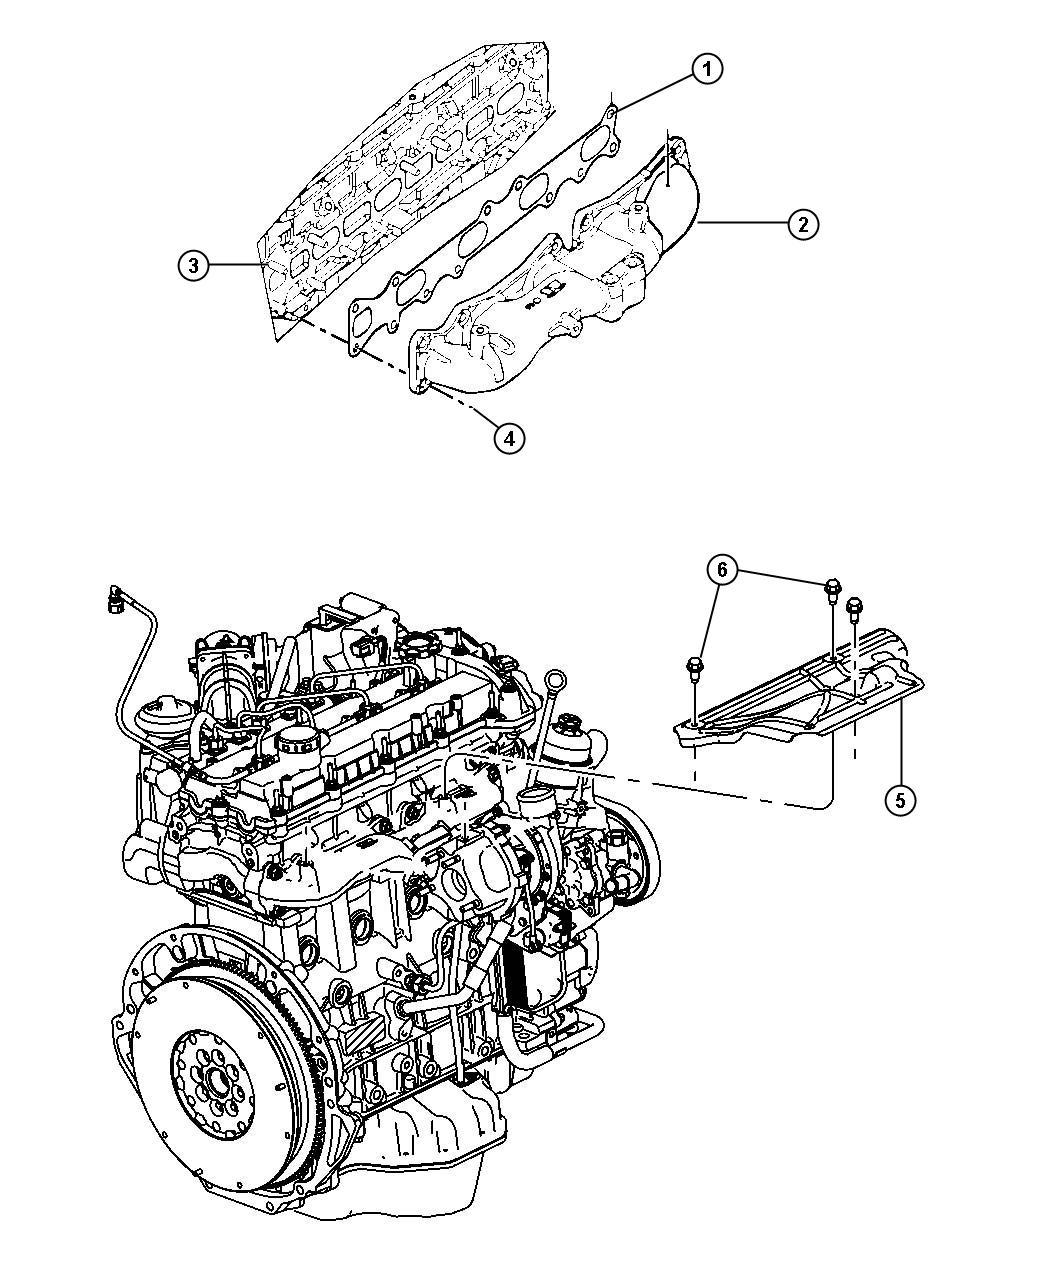 Jeep Grand Cherokee Nut Flange Mounting